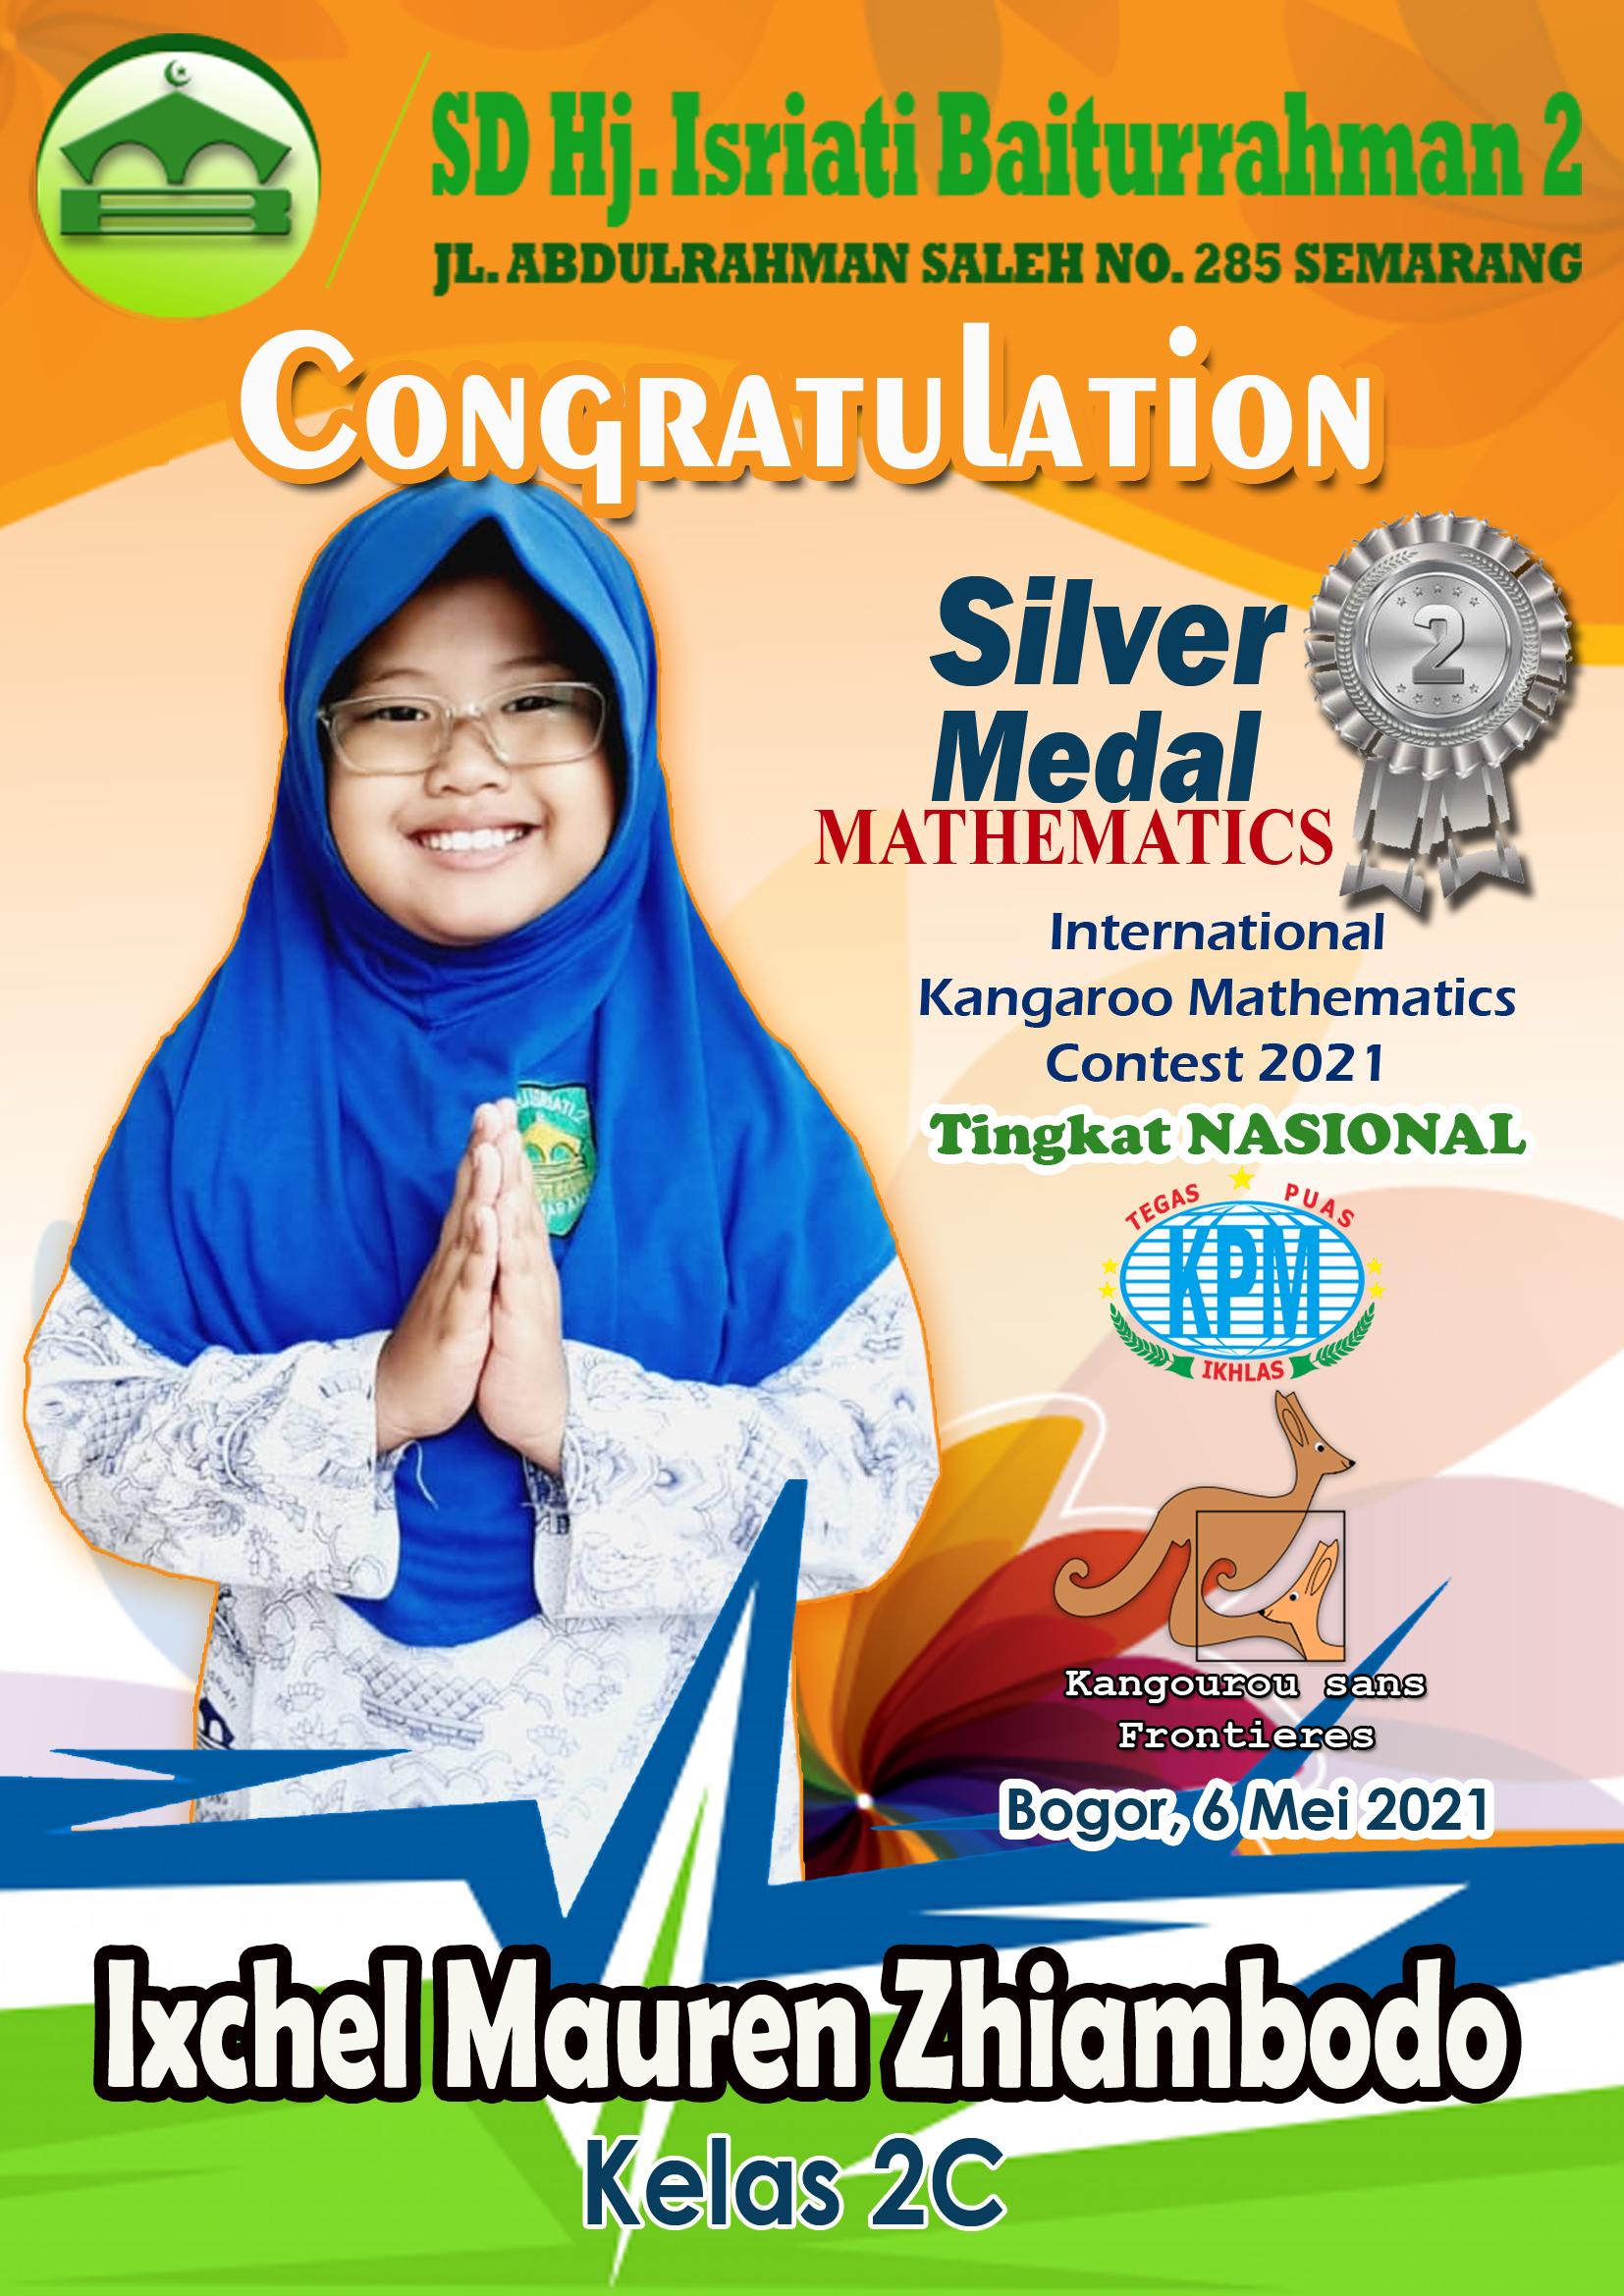 Silver Medal Mathematics International Kangaroo Mathematics Contest 2021 Tk. Nasional